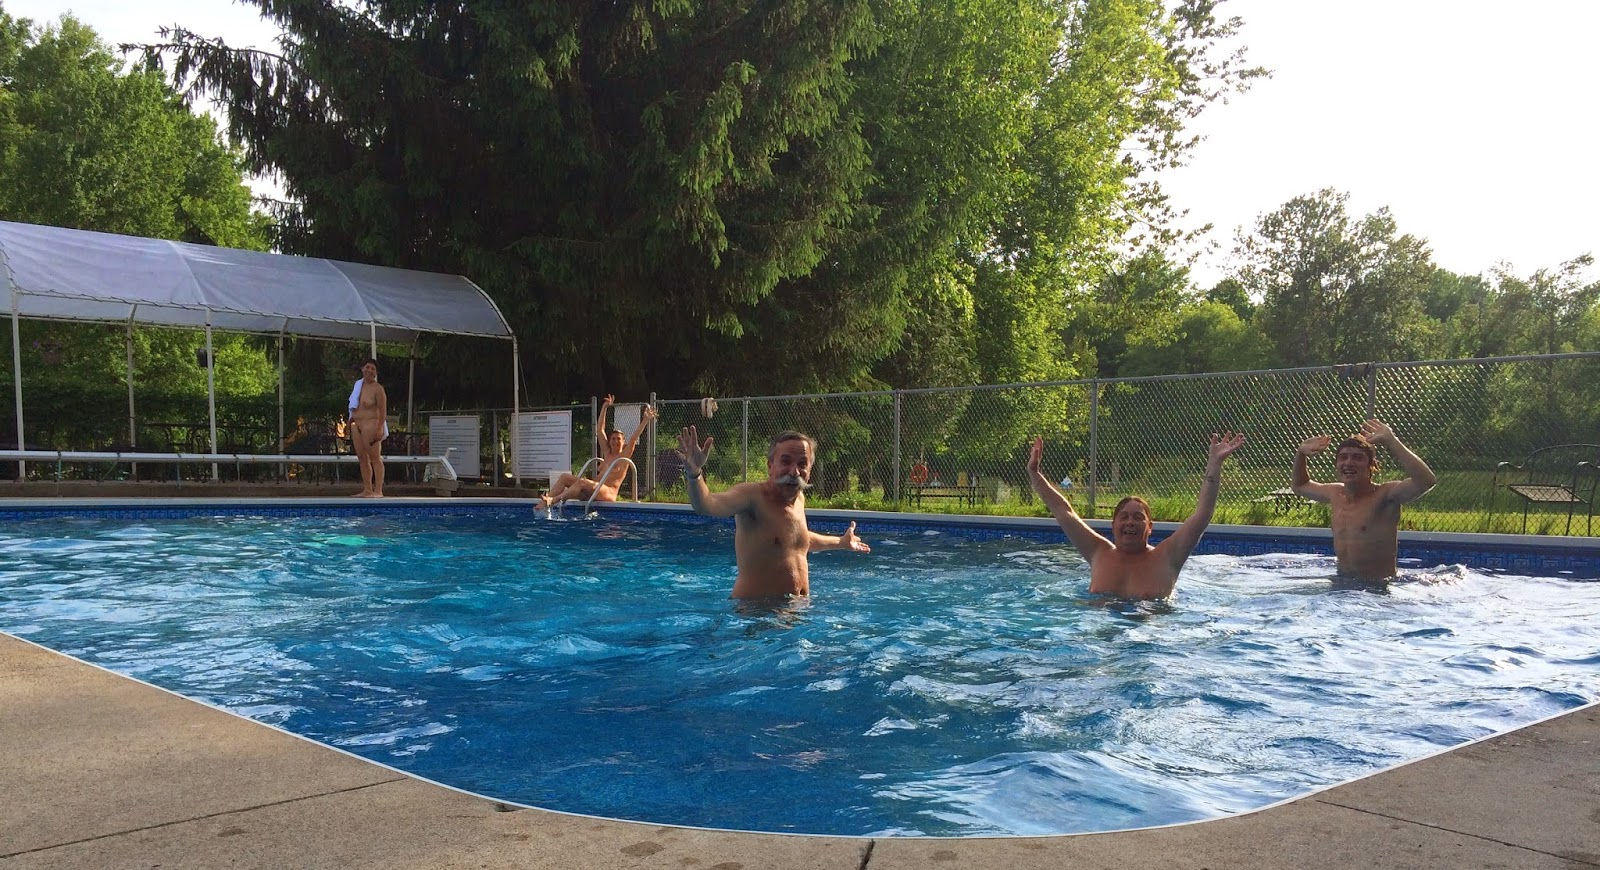 The pool at Bare Oaks Family Naturist Park